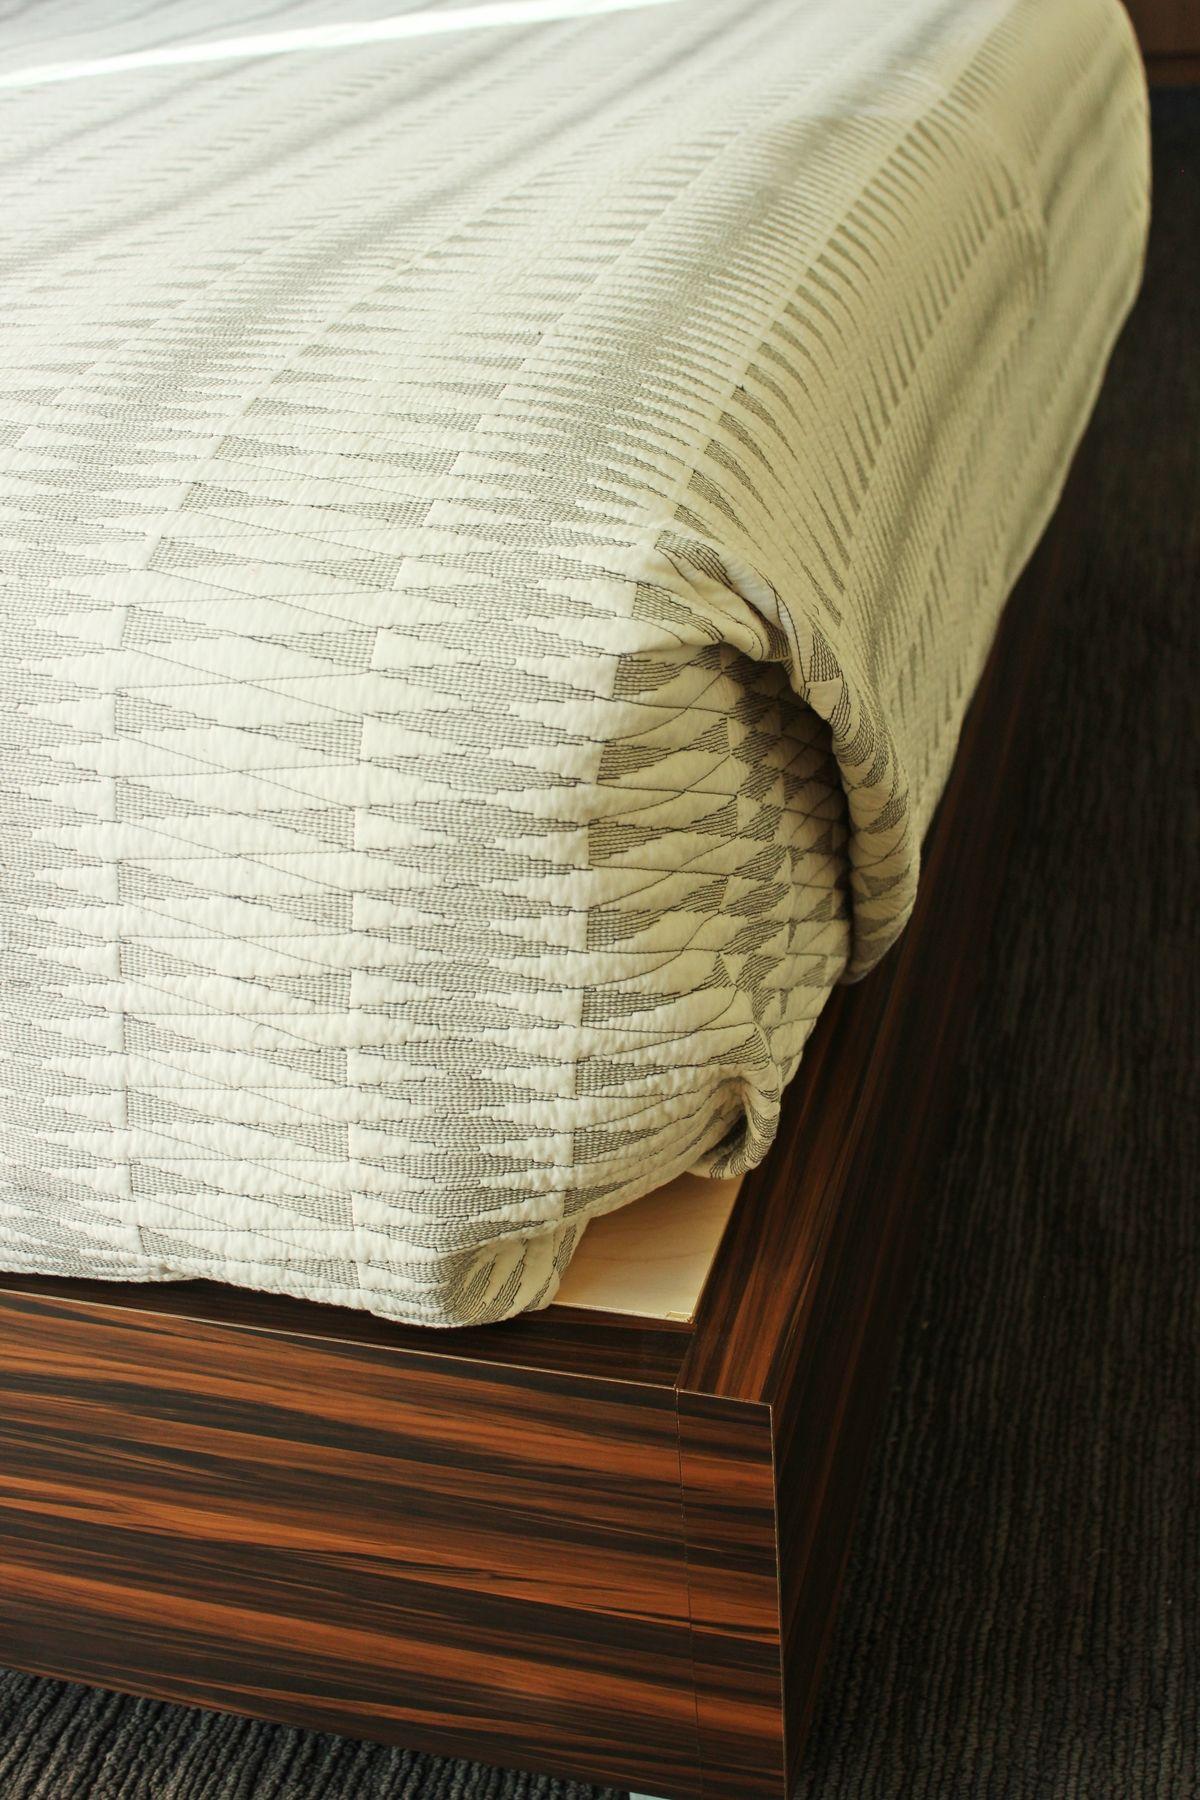 How to Make a Bed - platform bed